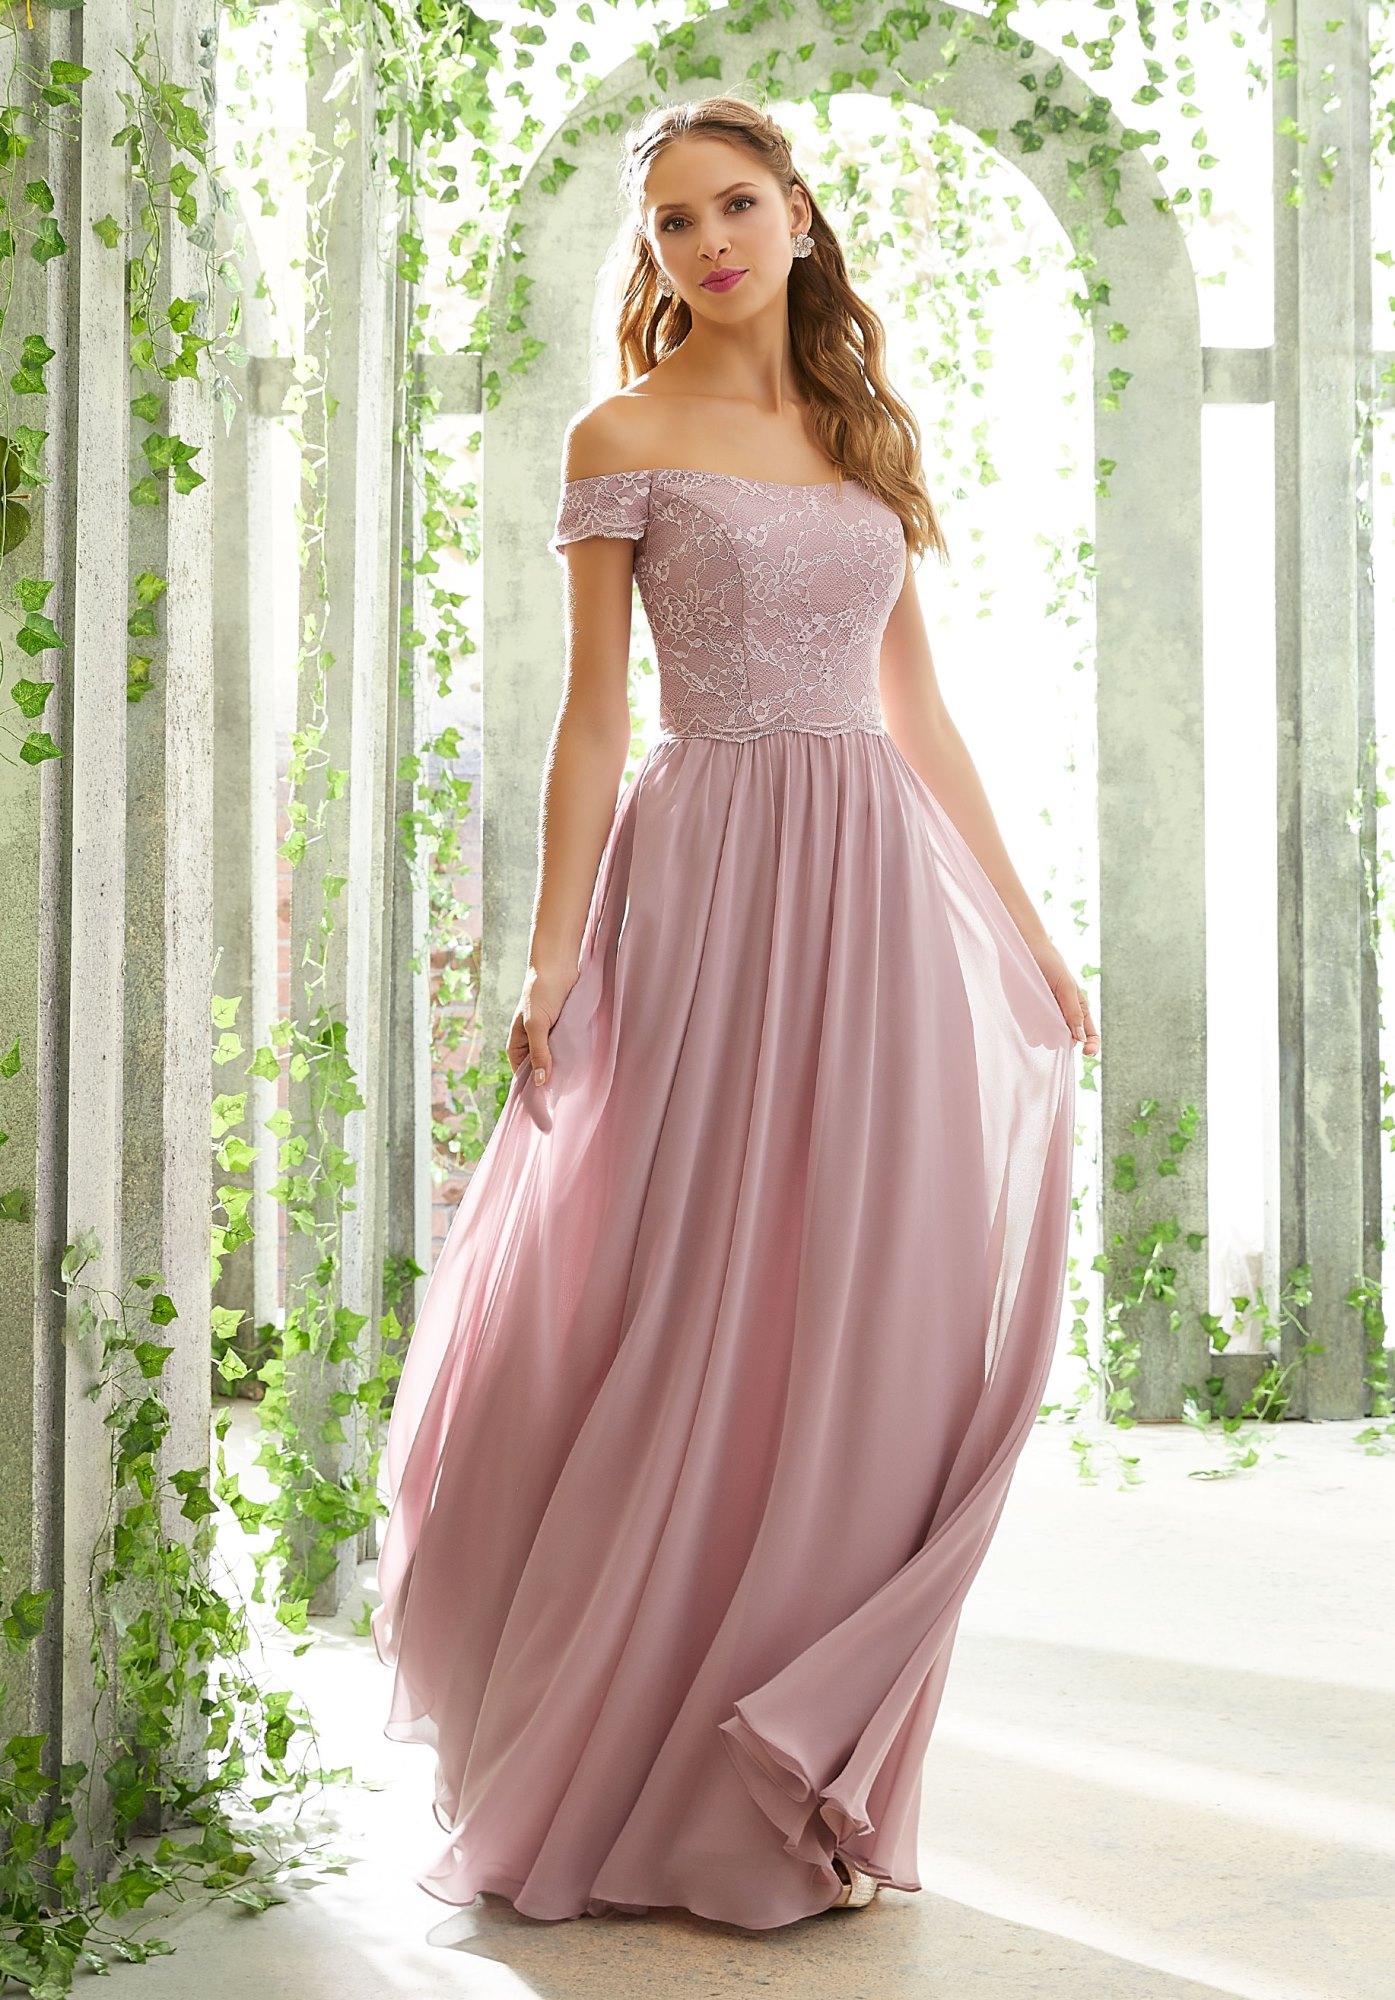 Bridesmaid Dress - Mori Lee BRIDESMAIDS Spring 2019